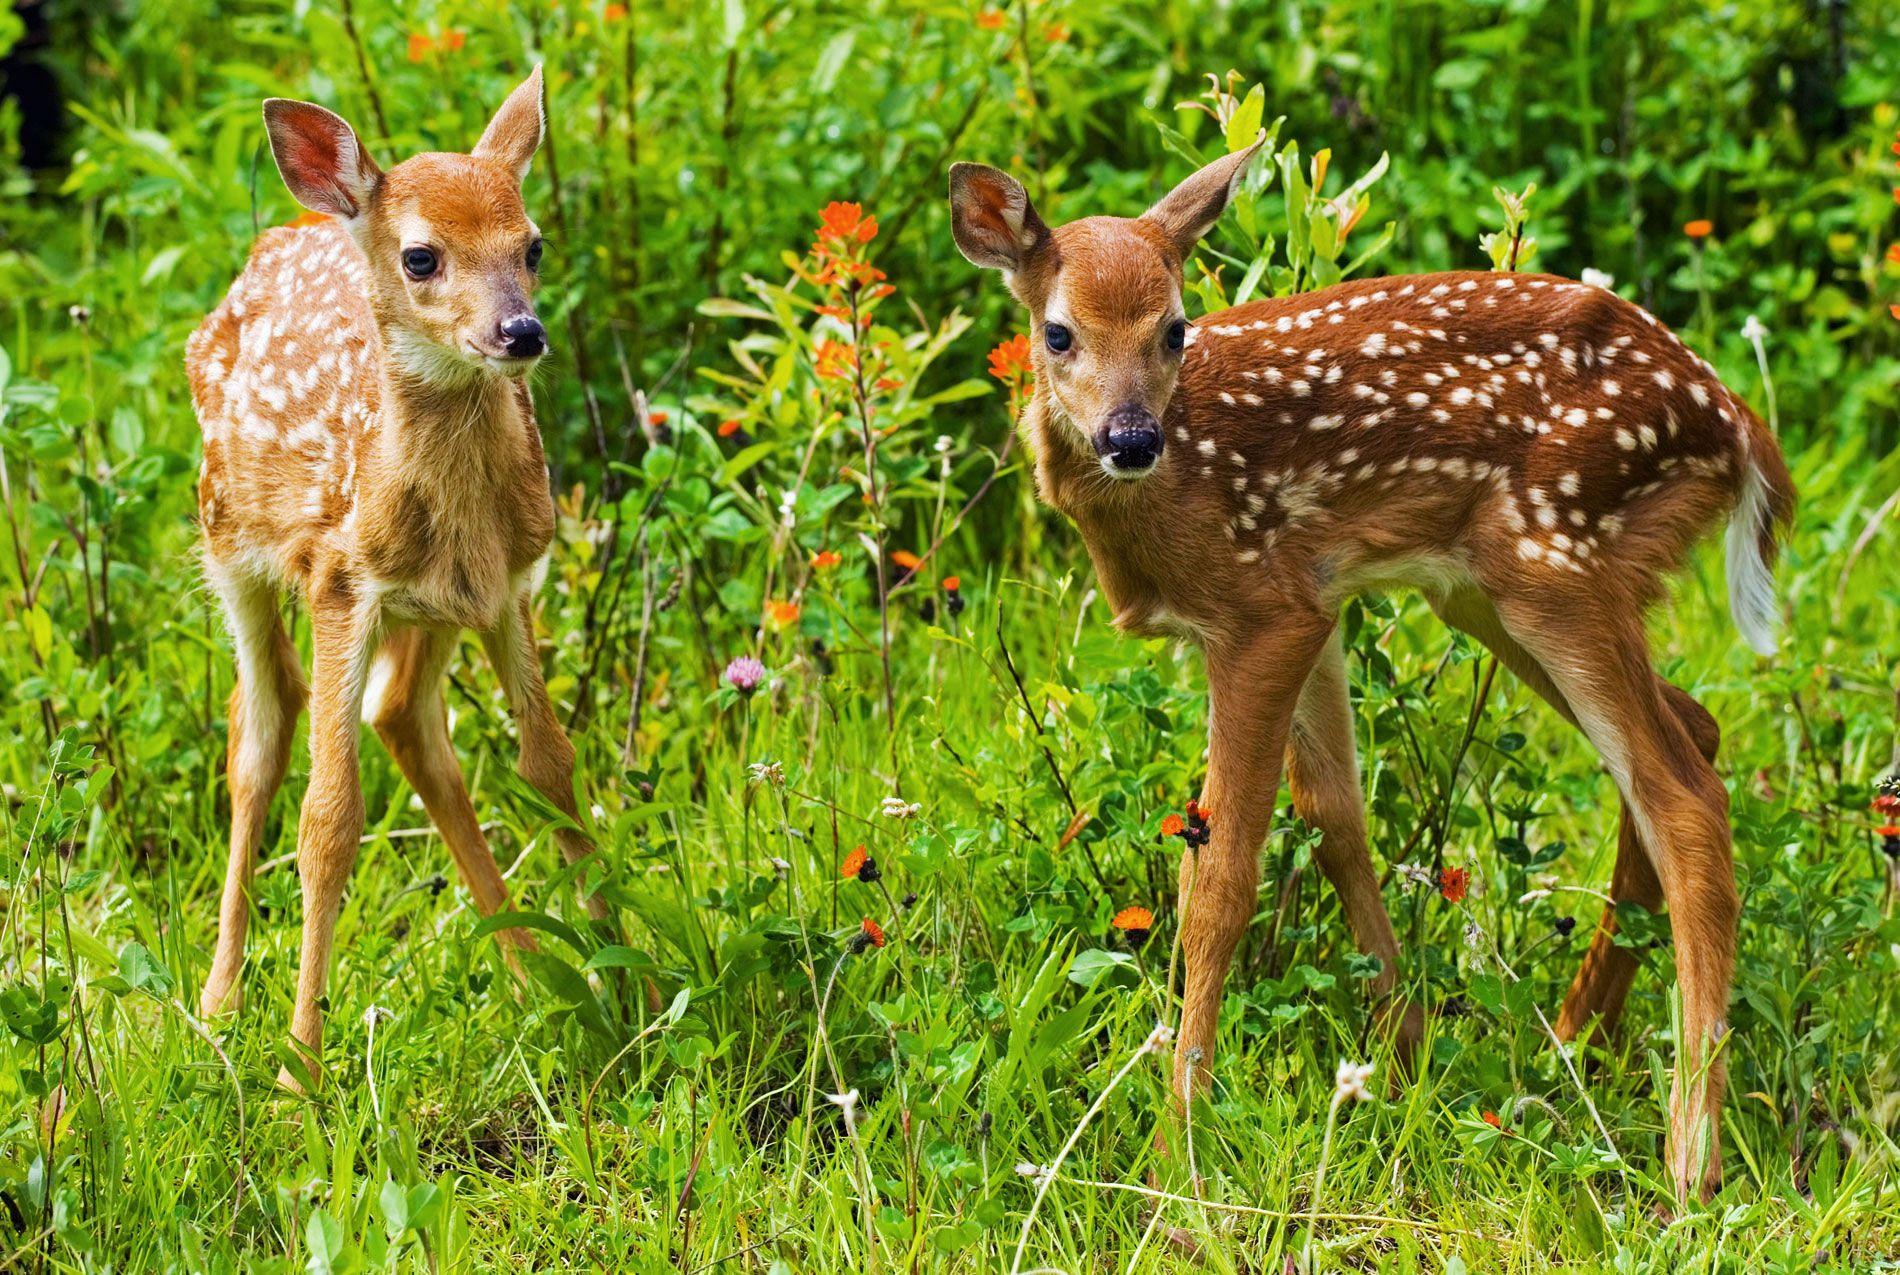 Deer Nature Animals Fawns Baby Animals Wallpapers Hd: Baby Deer Wallpaper 2014 Free 15 HD Wallpapers